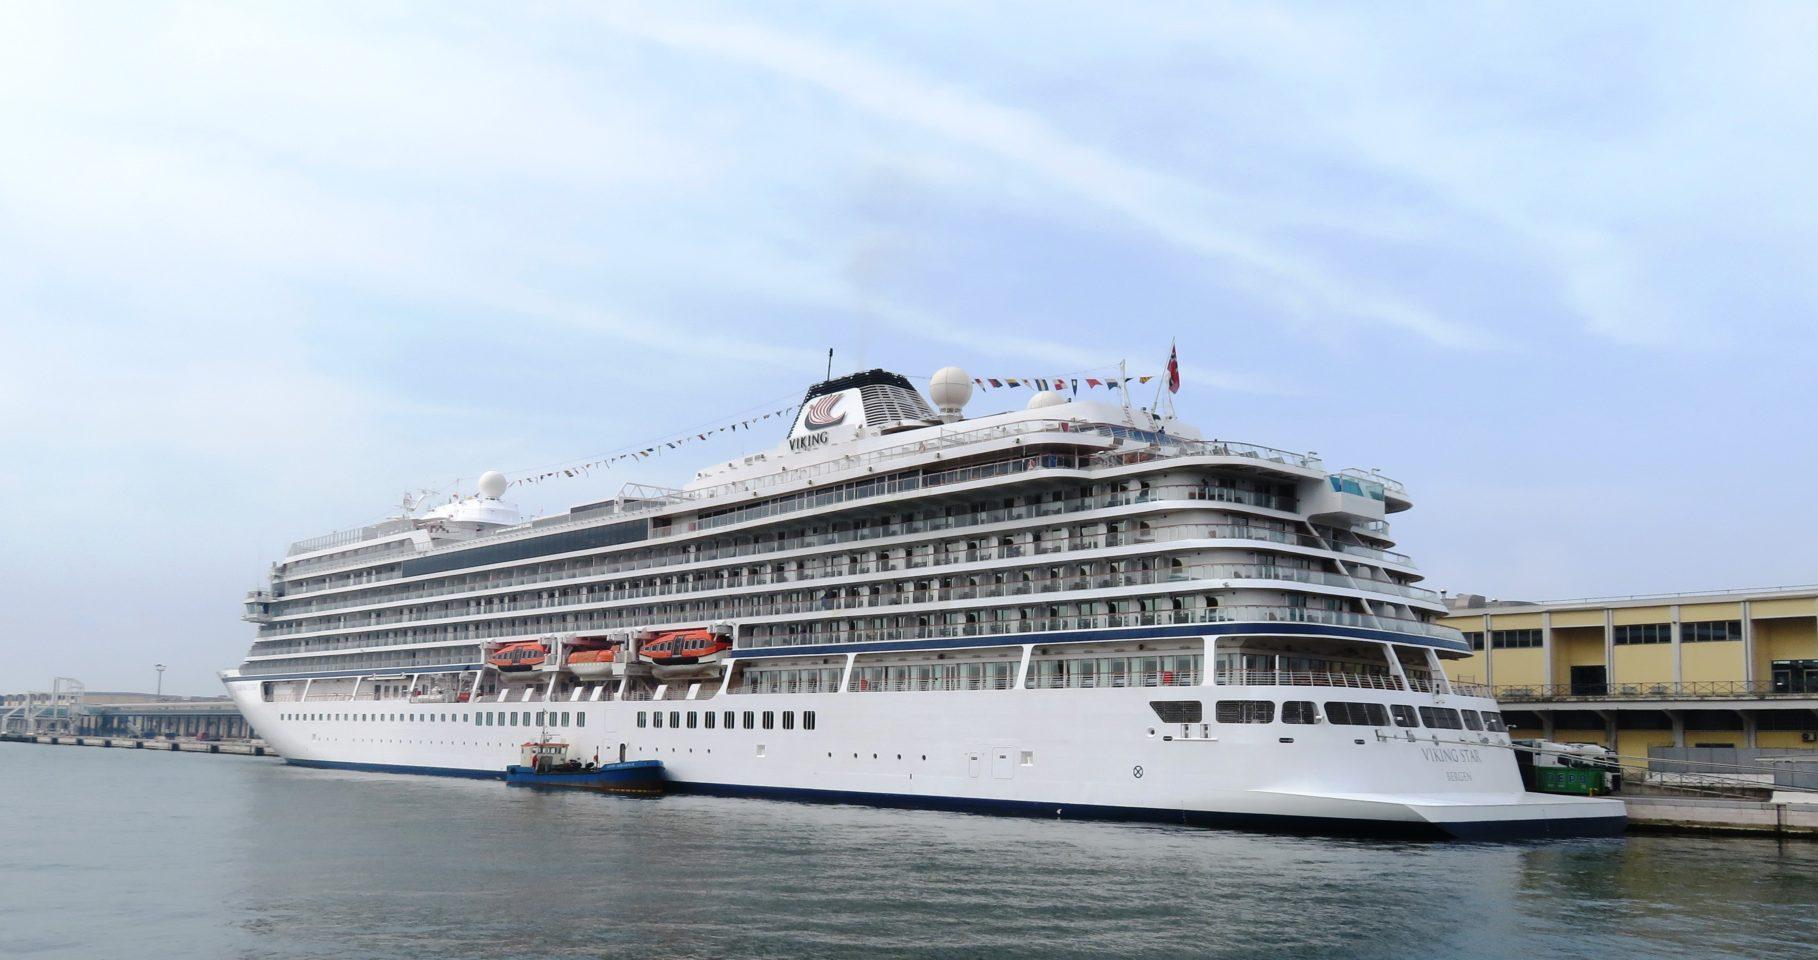 Viking Ocean Cruise Ships ~ Viking Star docked in Venice Italy